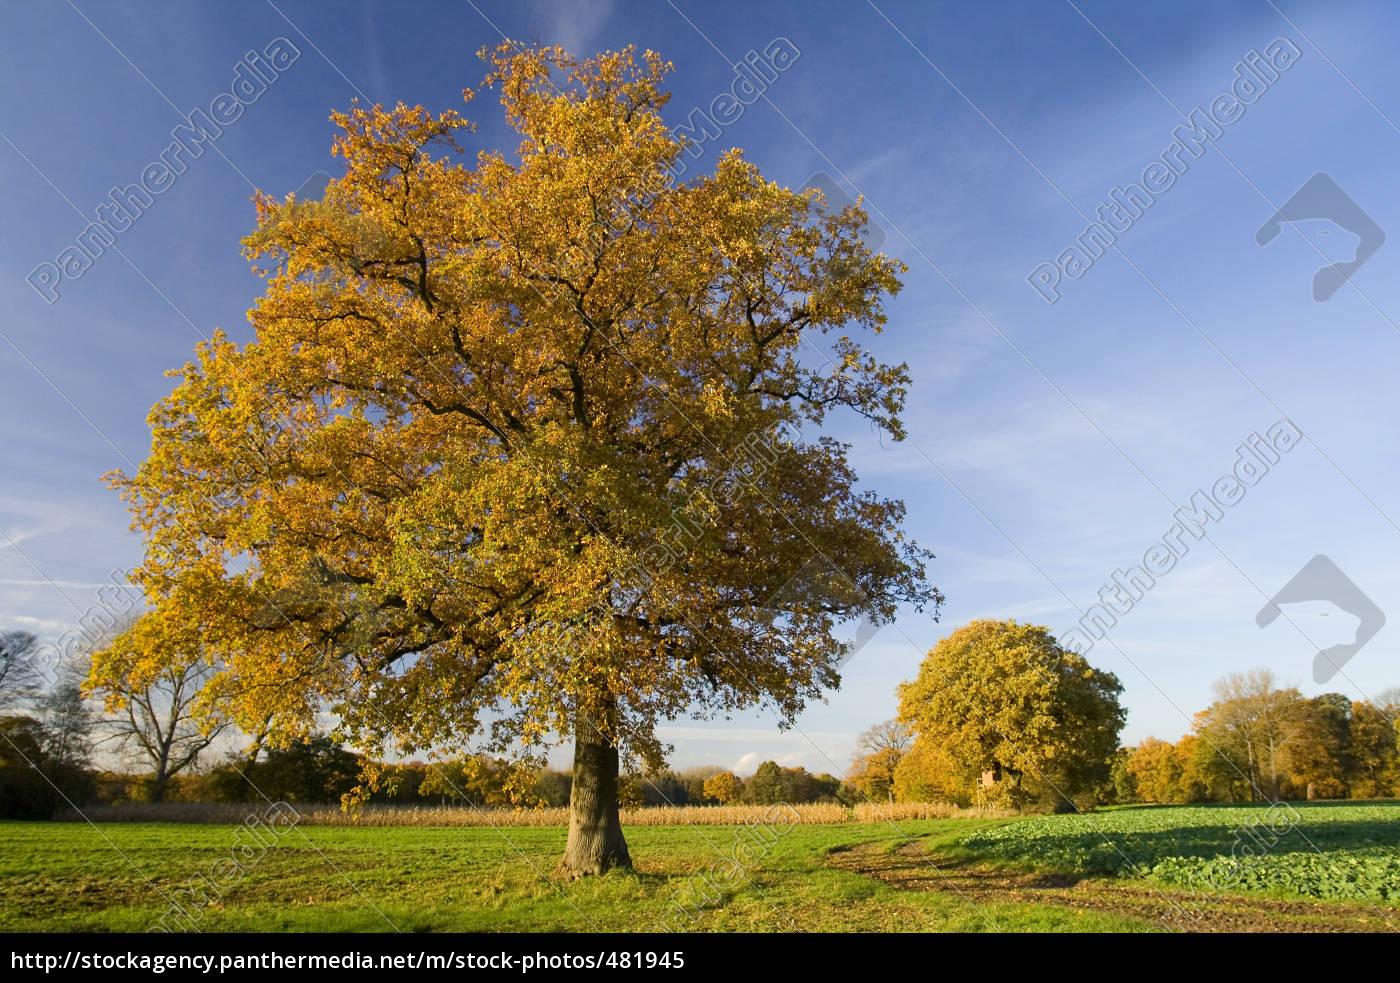 solitary, oak, tree, in, autumn - 481945